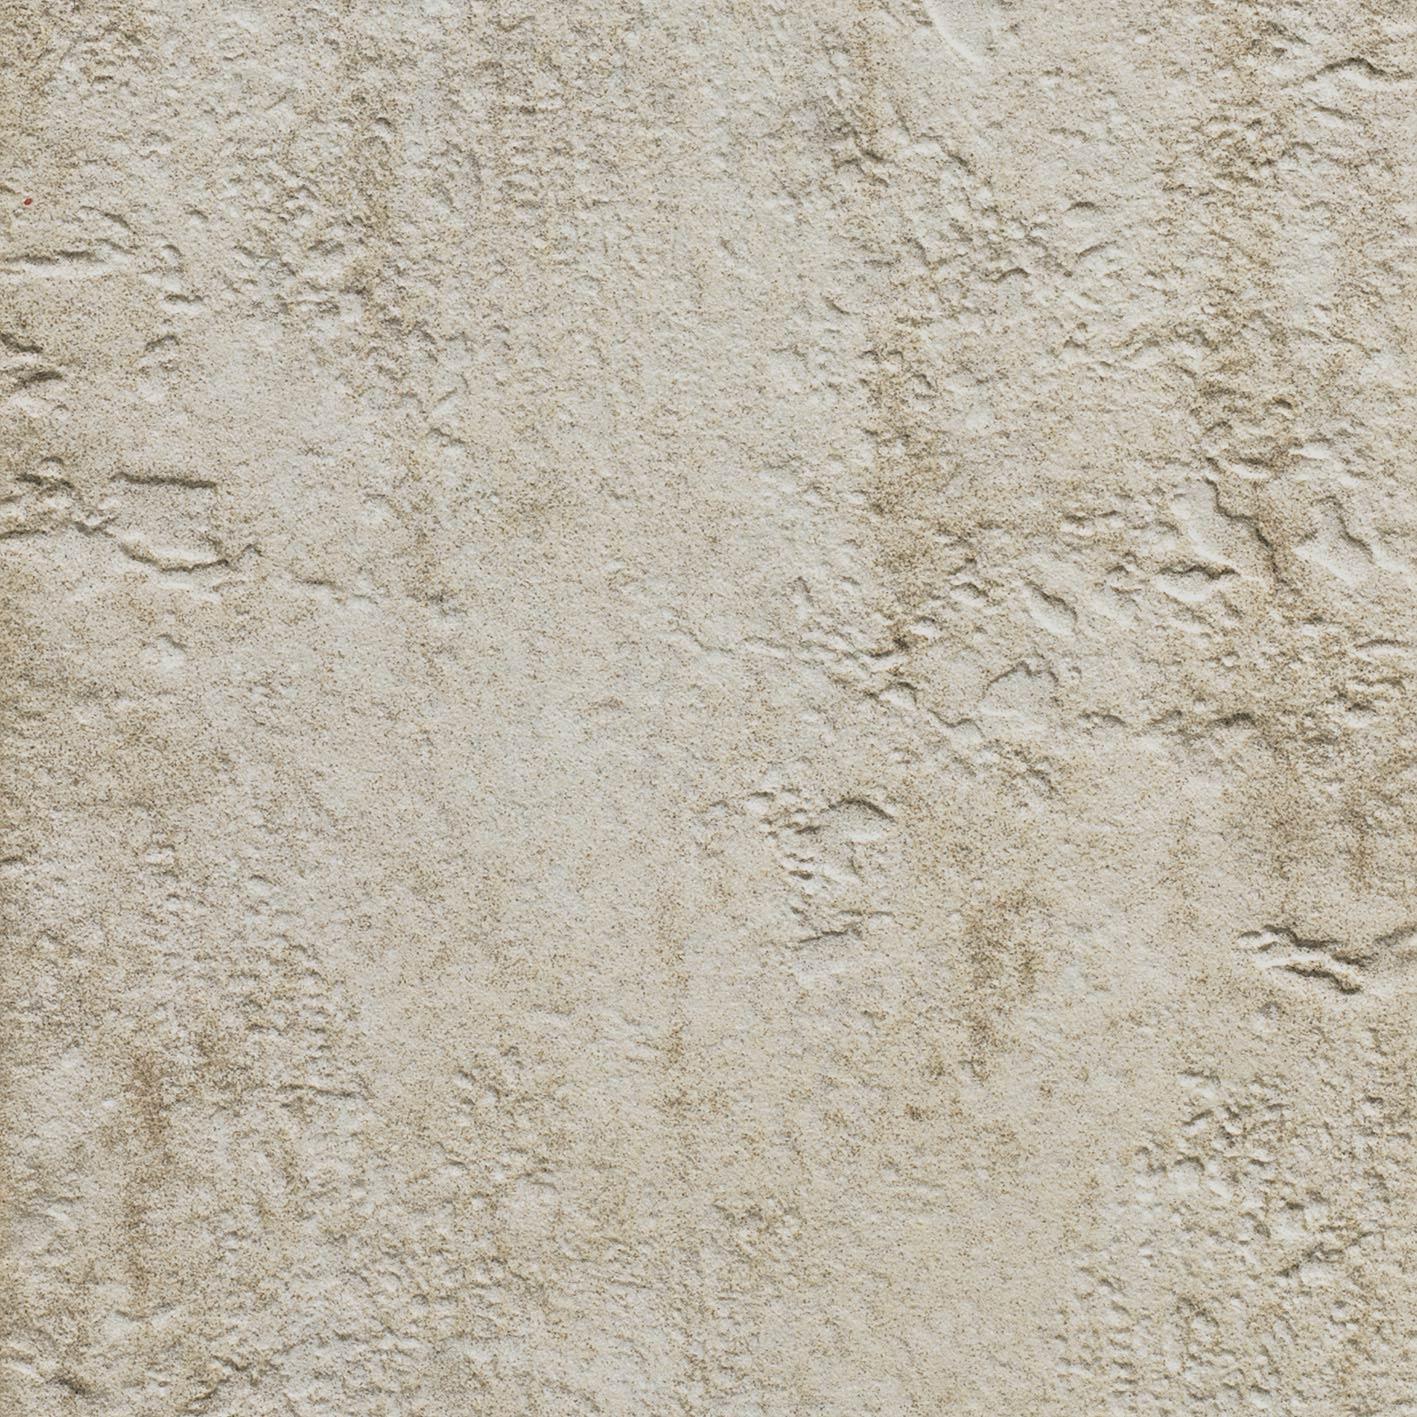 Carrelage sol et mur cr me vestige x cm leroy for Carrelage vestige leroy merlin